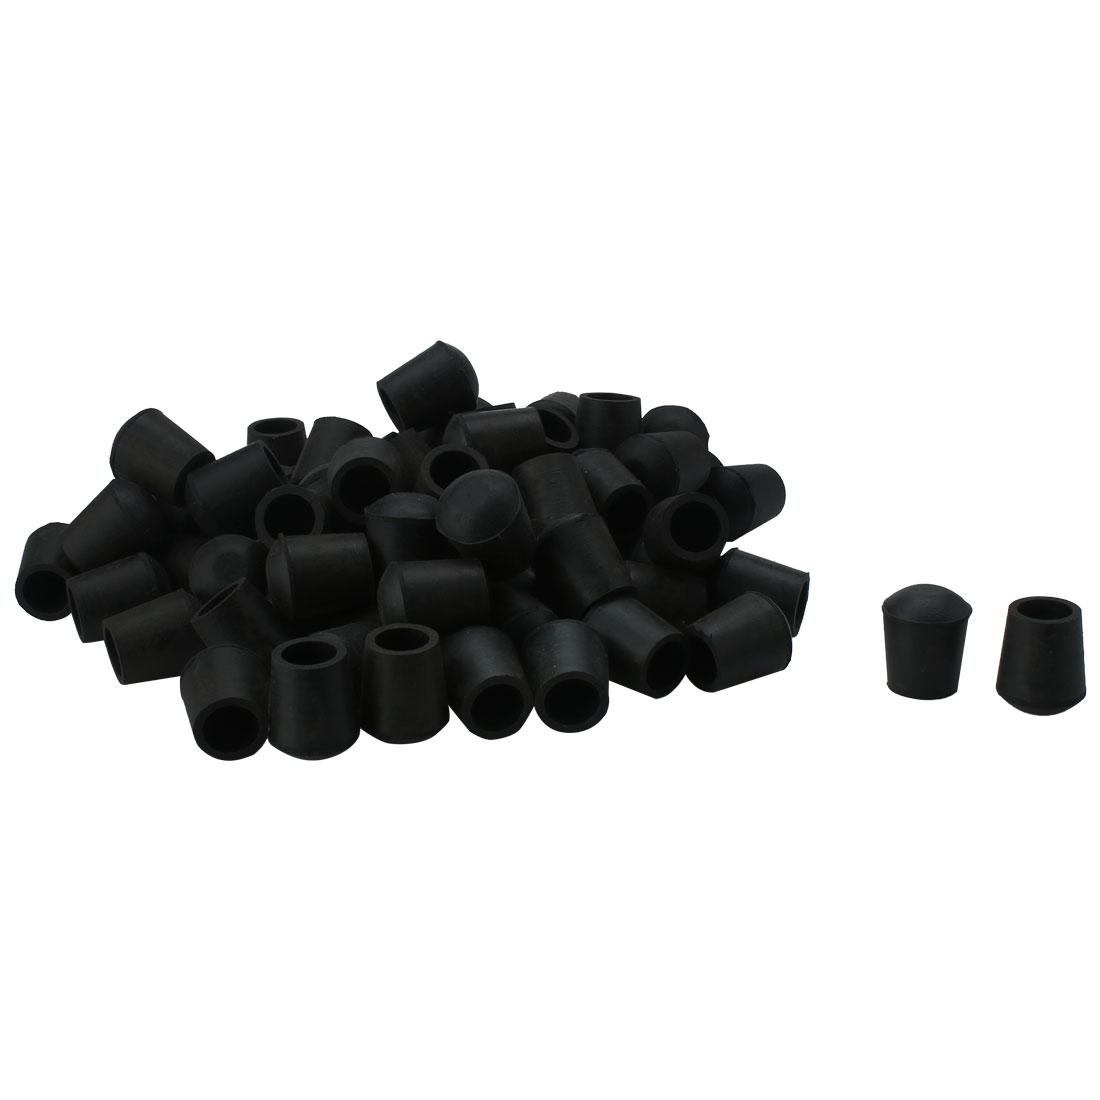 Furniture Table Crutch Feet Stools Protector Black PVC Chair Leg Tip Pad 80pcs